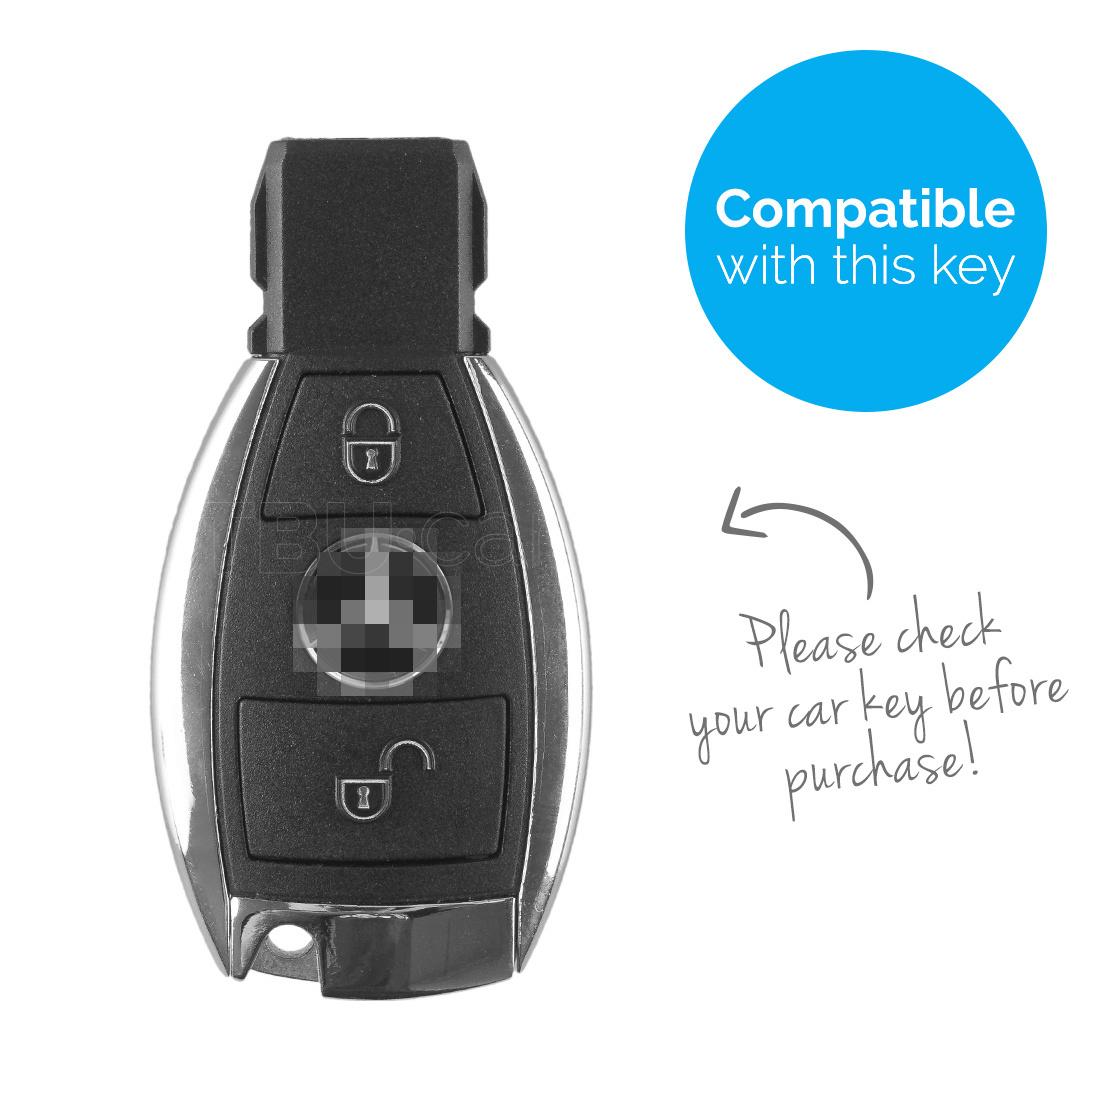 TBU car TBU car Autoschlüssel Hülle kompatibel mit Mercedes 2 Tasten - Schutzhülle aus Silikon - Auto Schlüsselhülle Cover in Blau